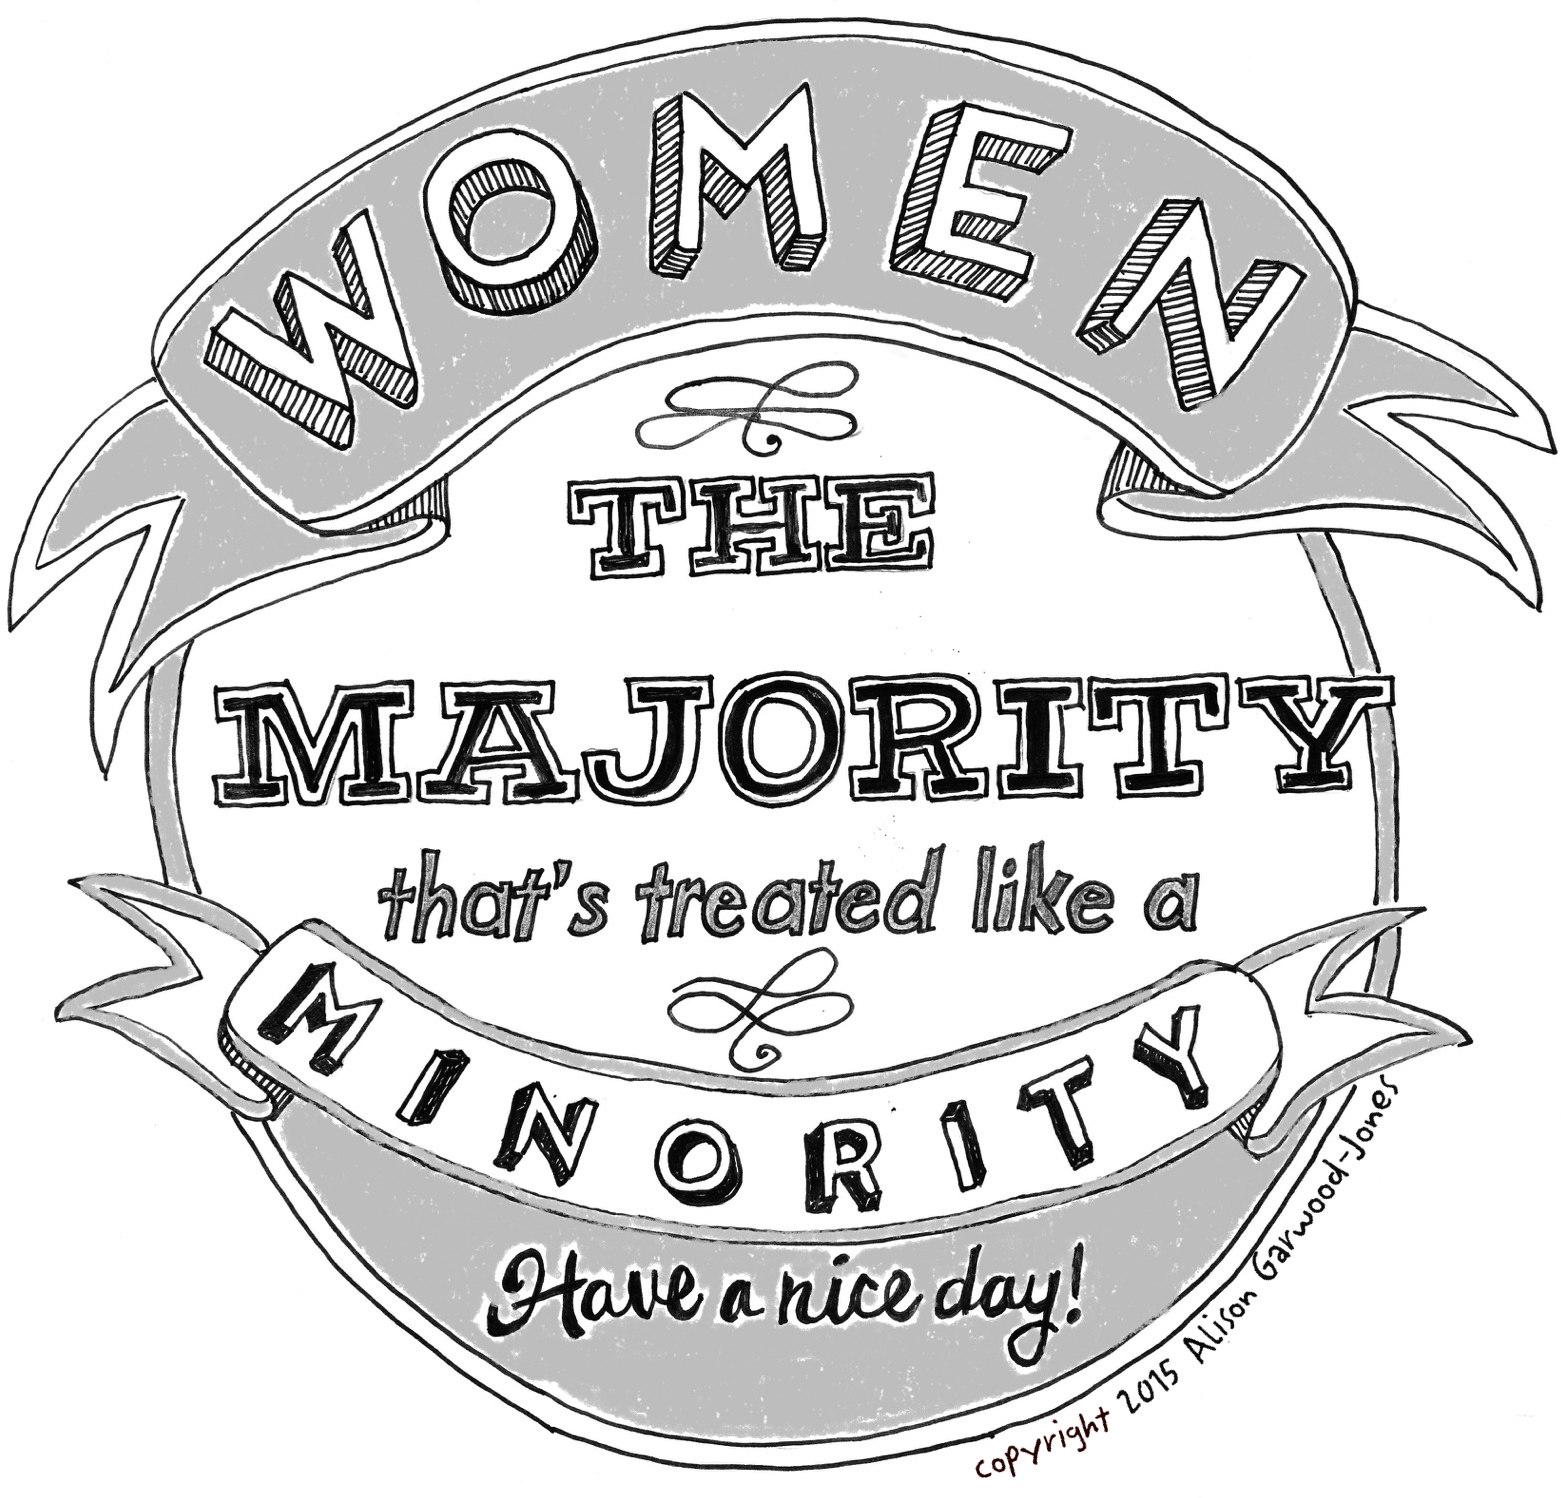 Homemade Crest - Women: The Majority that's treated like a Minority